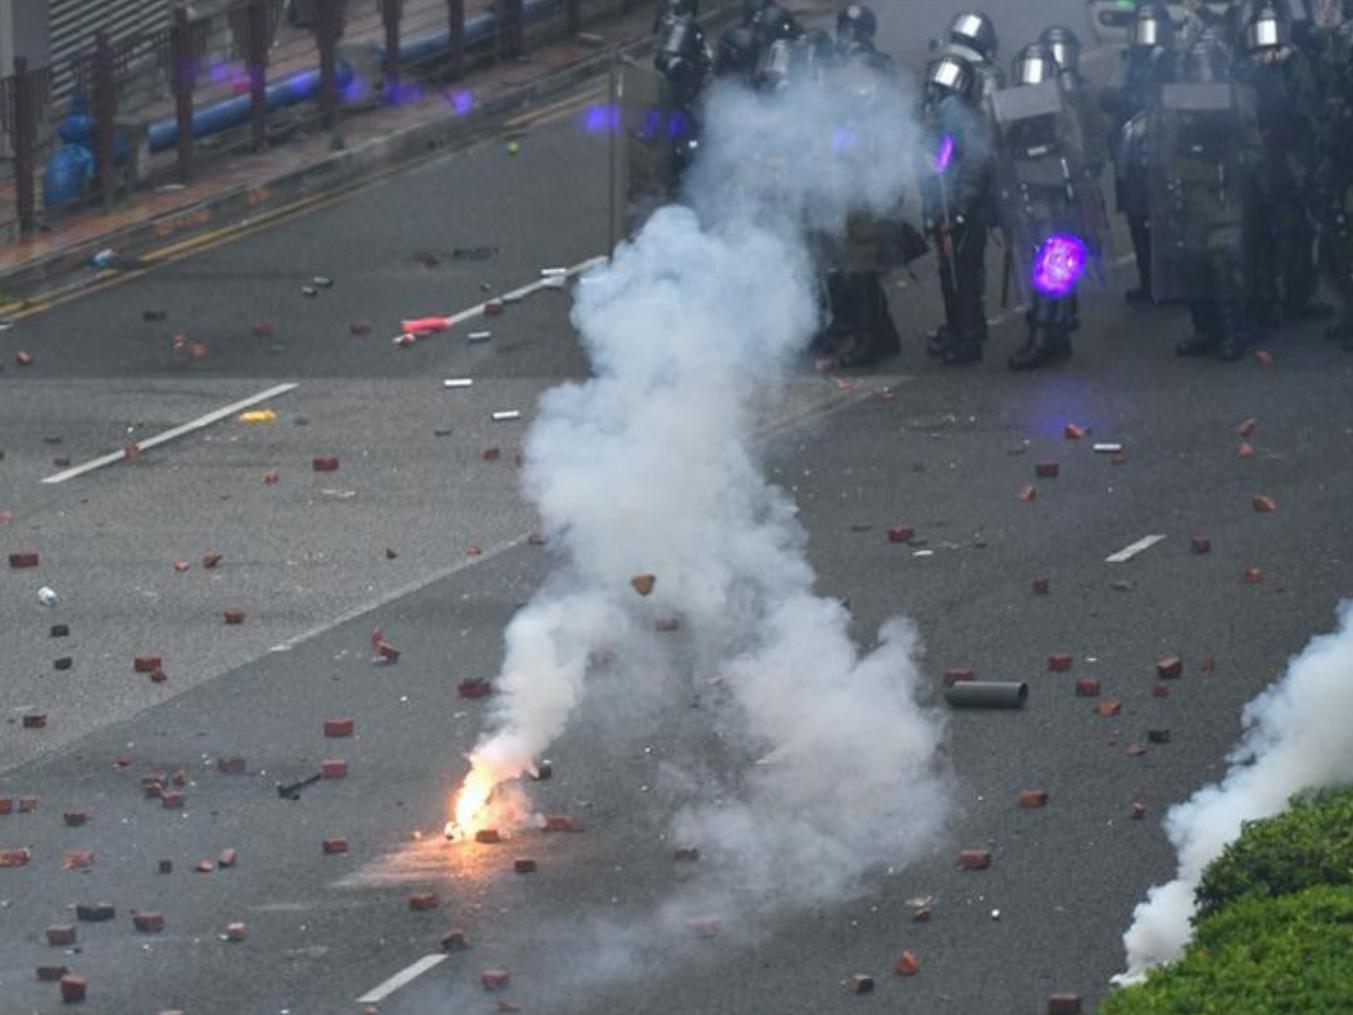 21 officers injured in weekend violent incidents: Hong Kong police